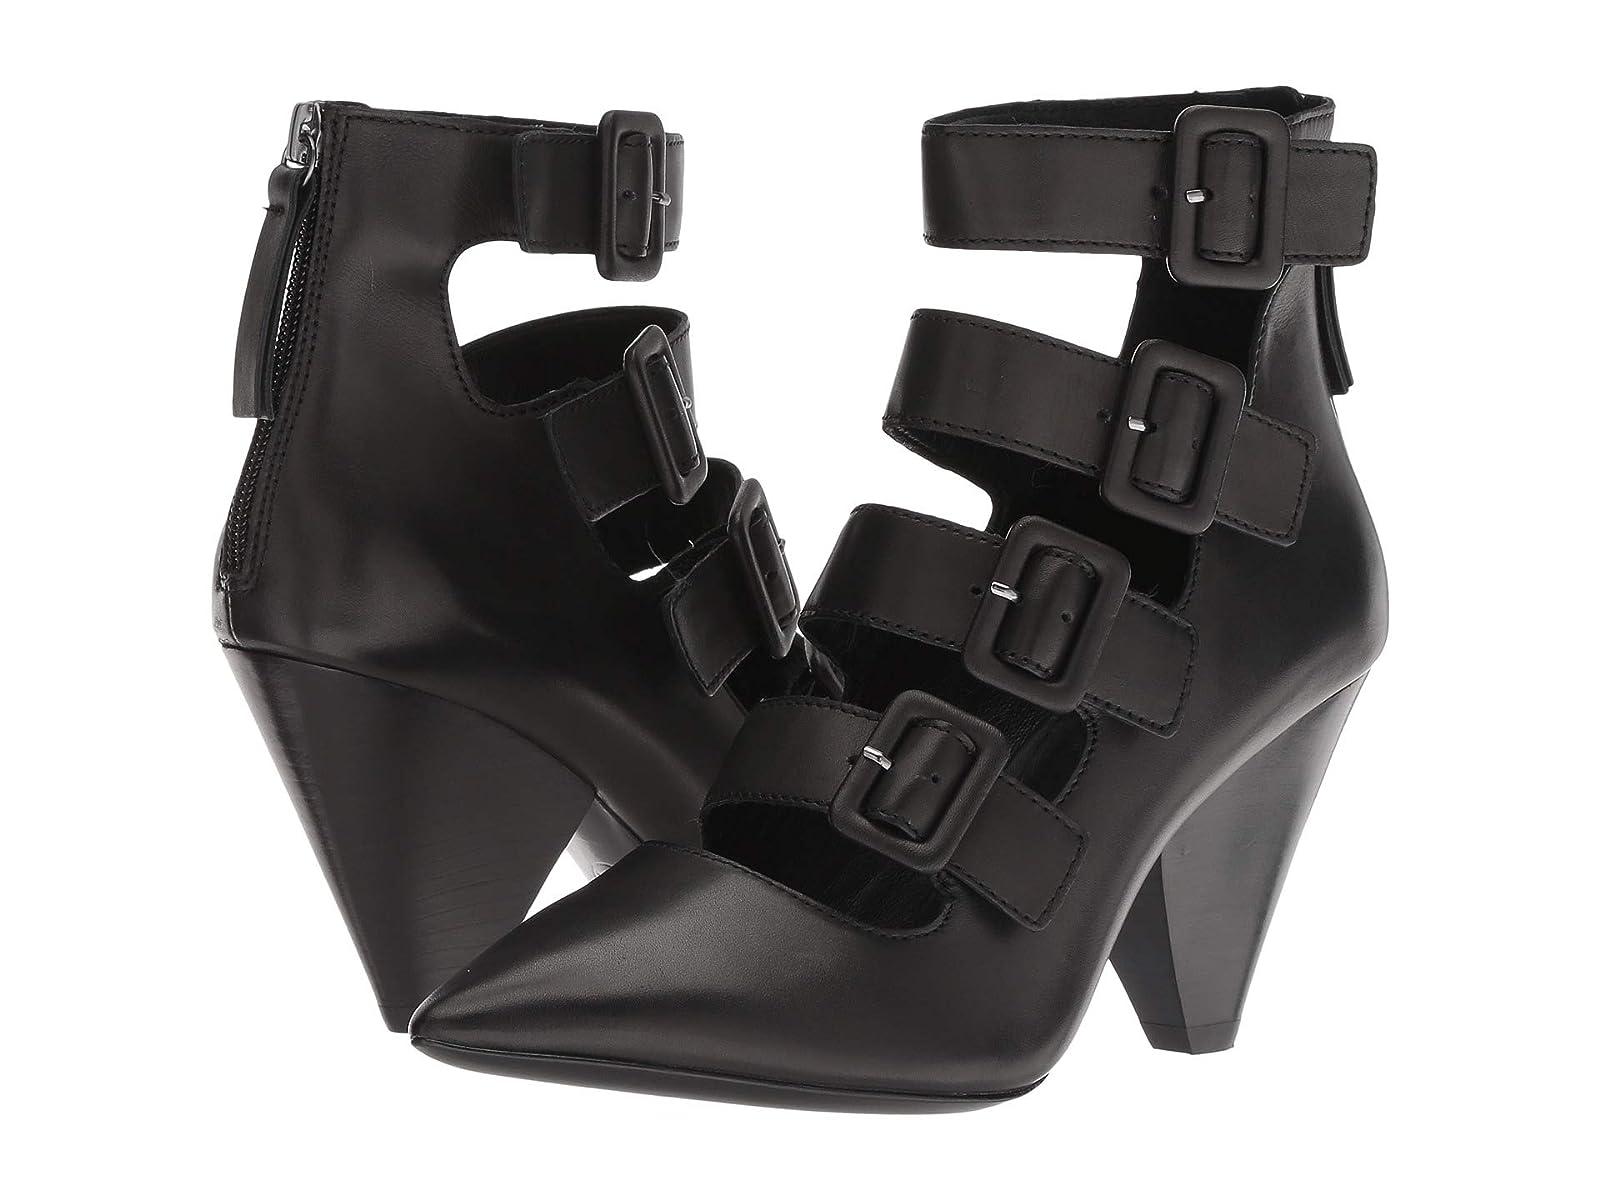 ASH DolbySelling fashionable and eye-catching shoes